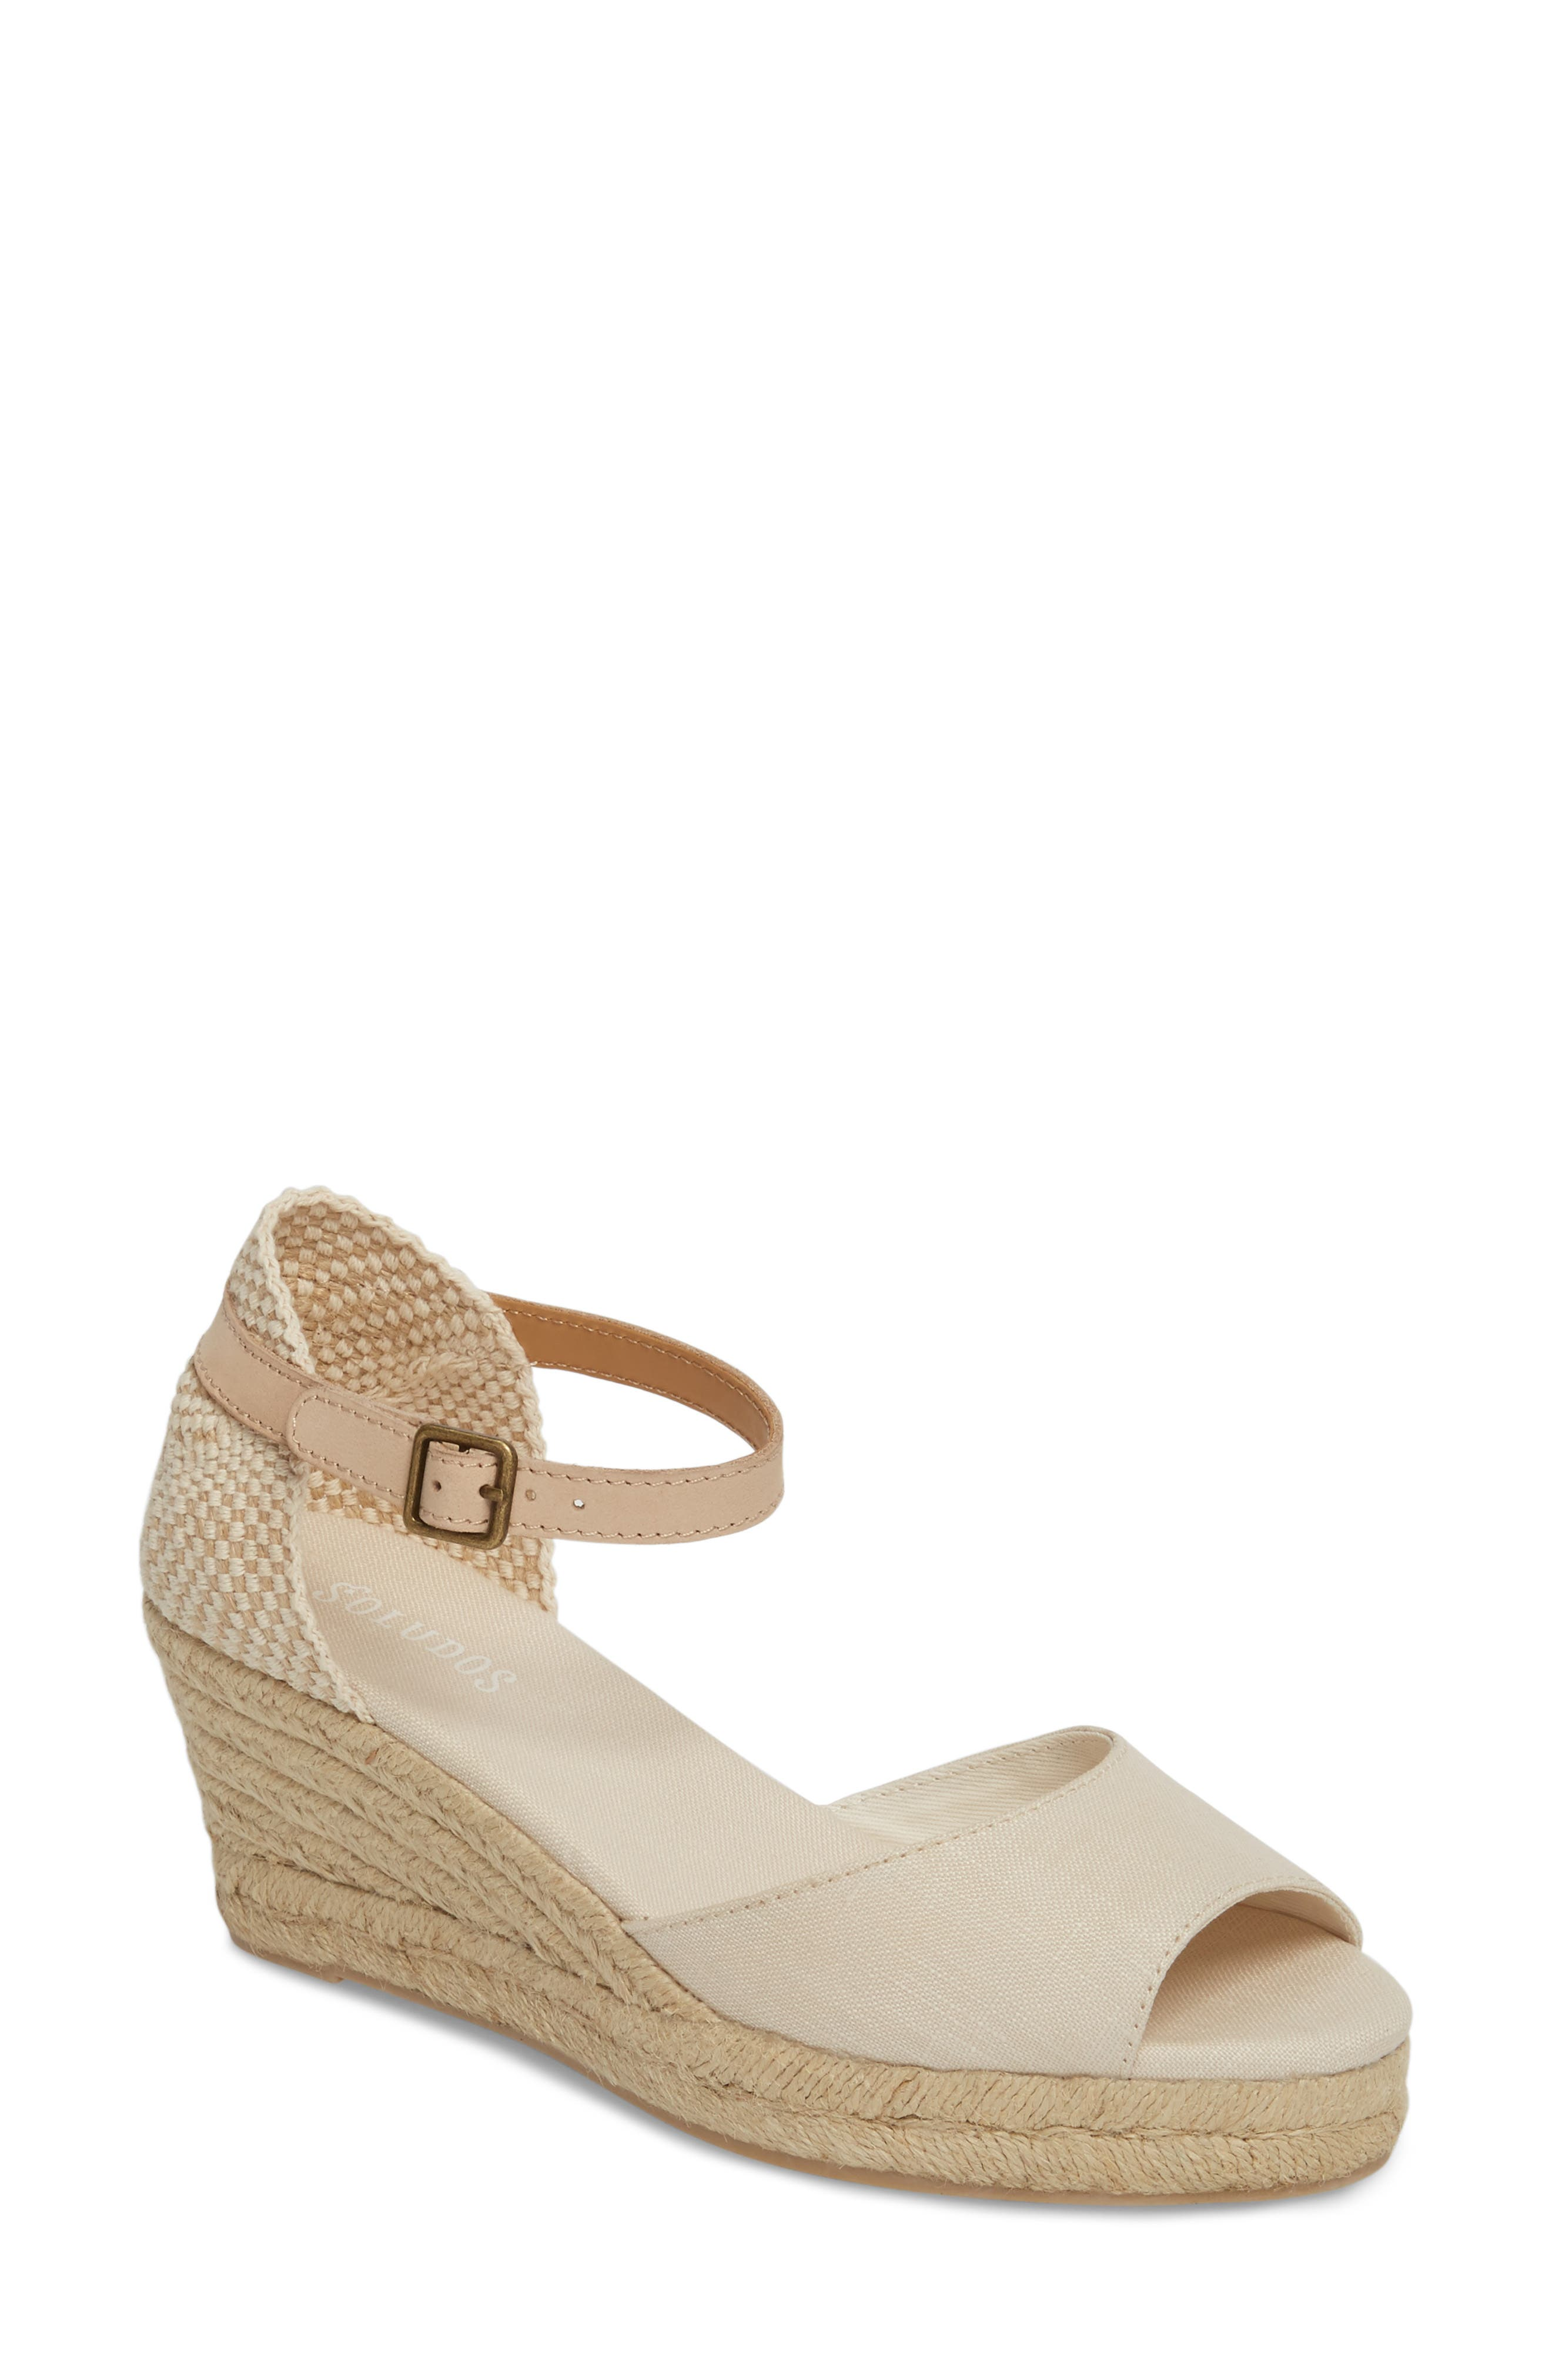 Espadrille Wedge Sandal,                         Main,                         color, BLUSH FABRIC